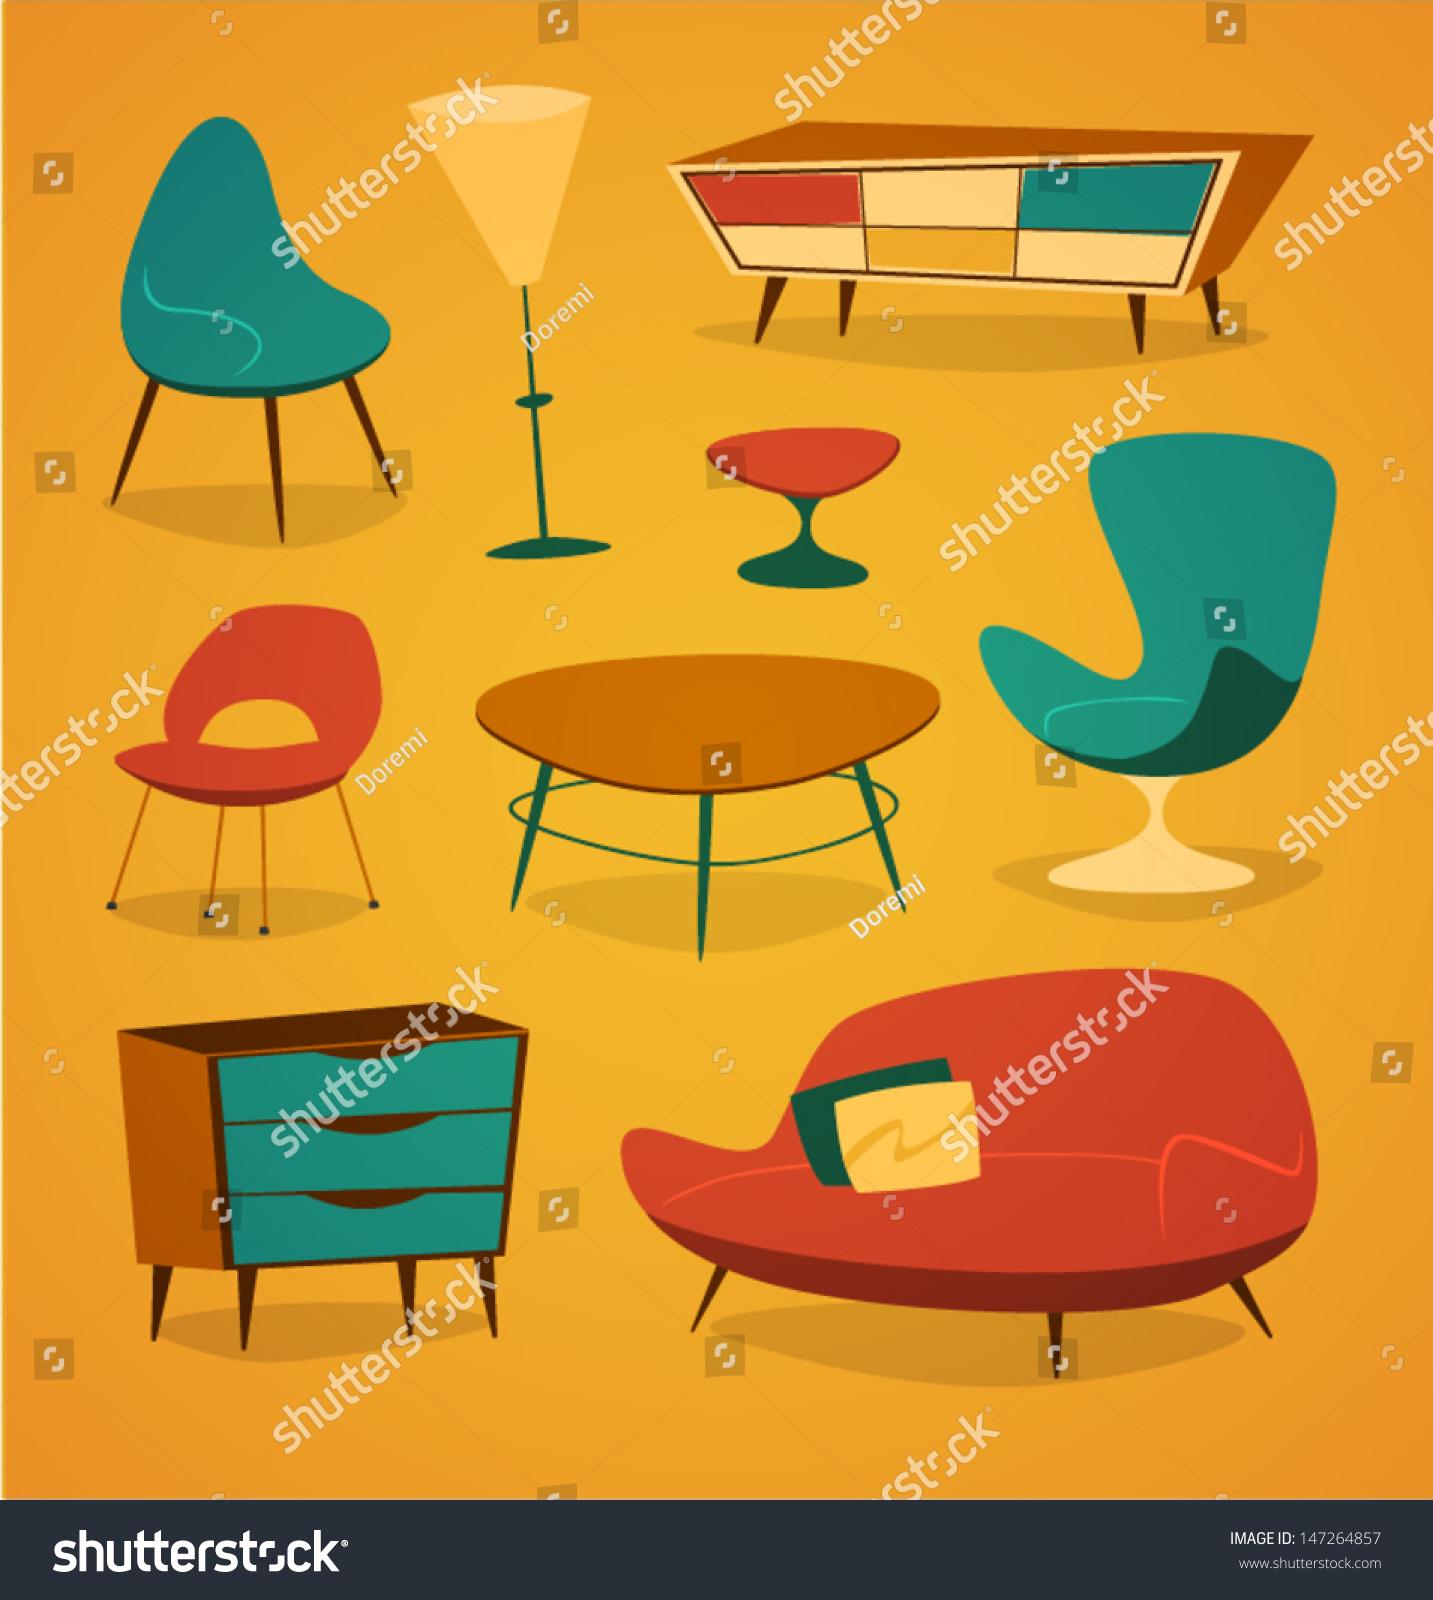 Retro Styled Modern Furniture Household Series Stock Vector 147264857    Shutterstock